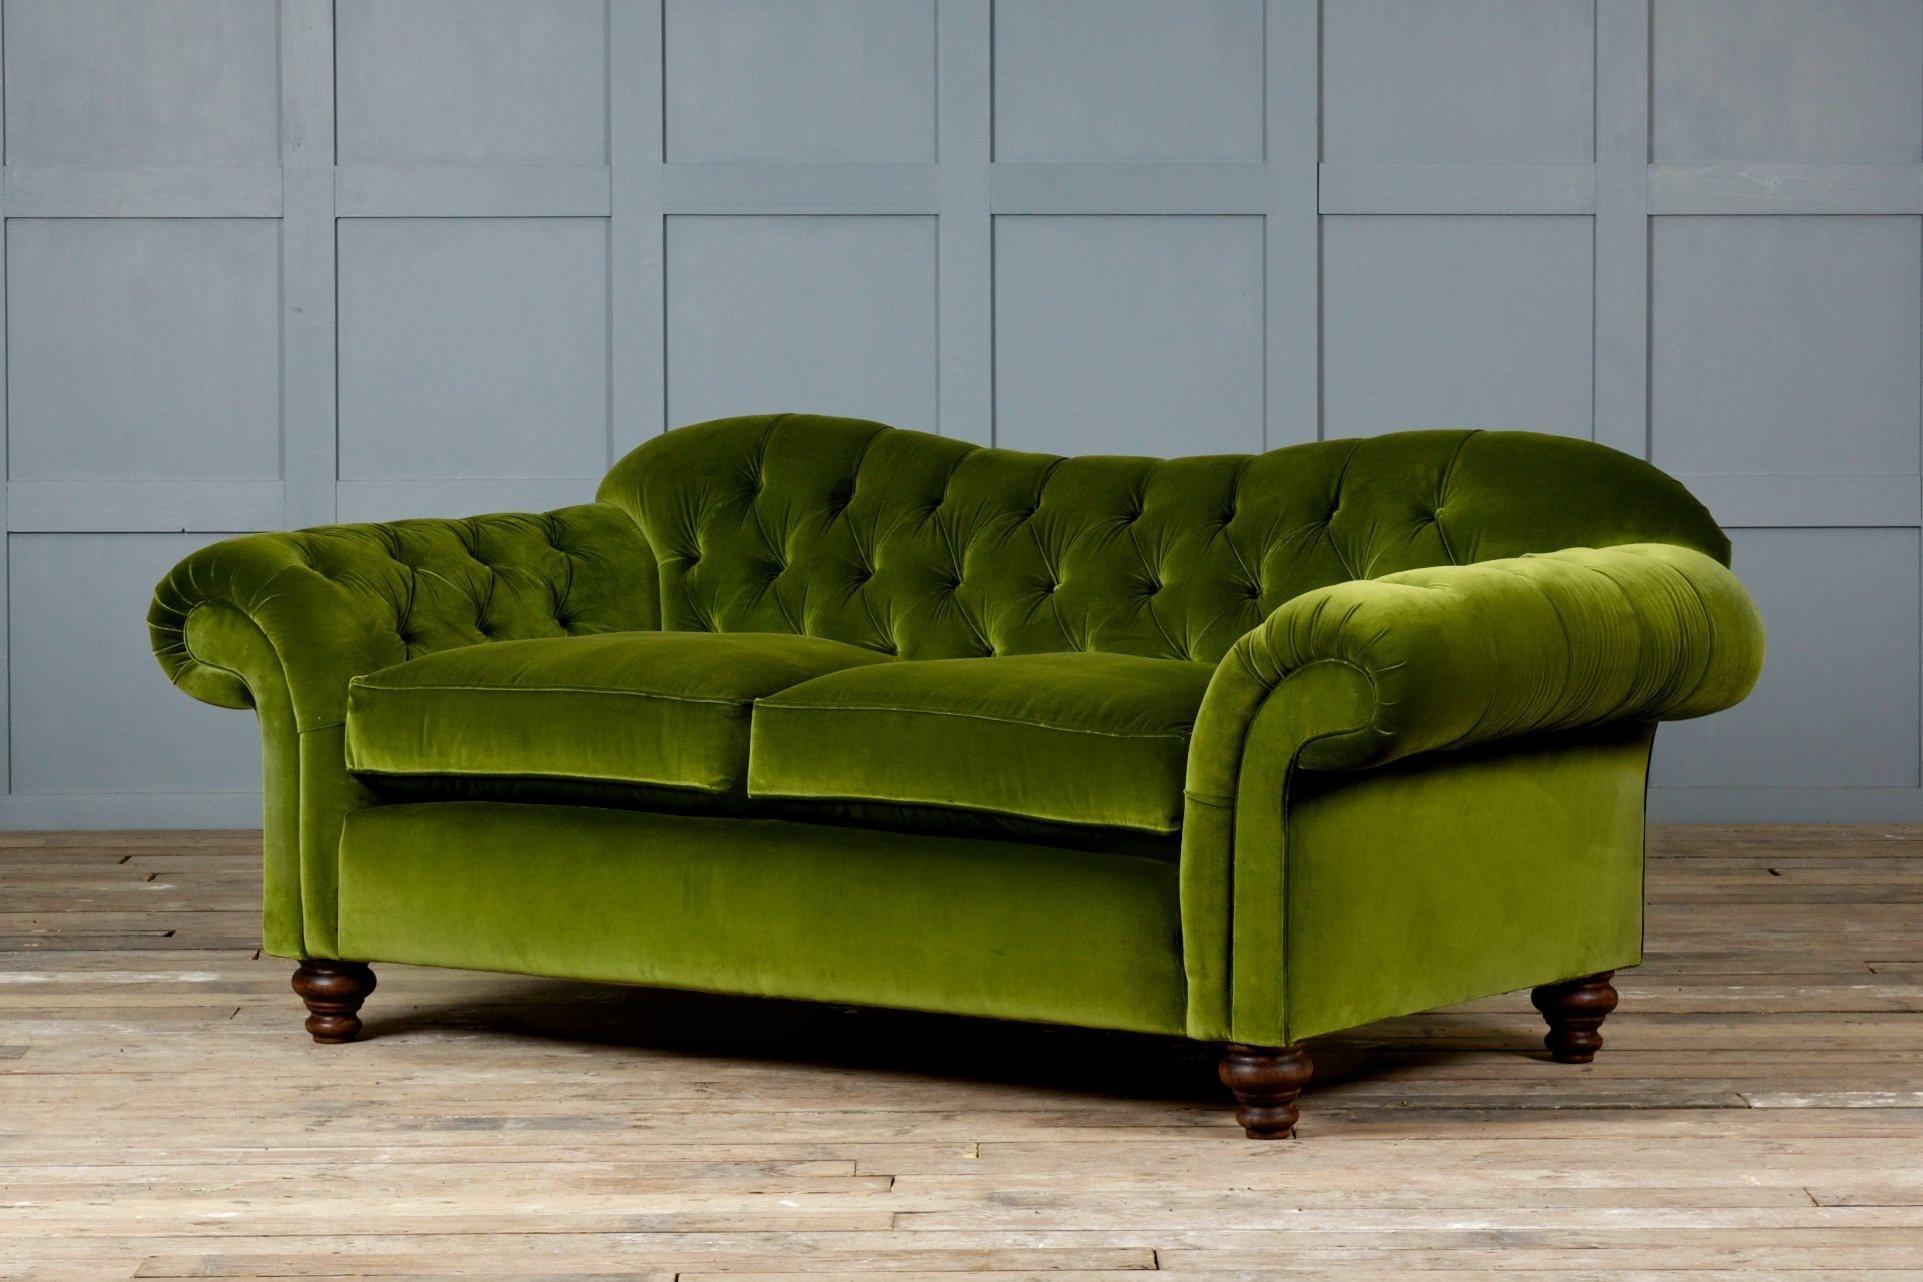 Furniture: Luxury Ava Velvet Tufted Sleeper Sofa For Elegant With Tufted Sleeper Sofas (Image 6 of 20)